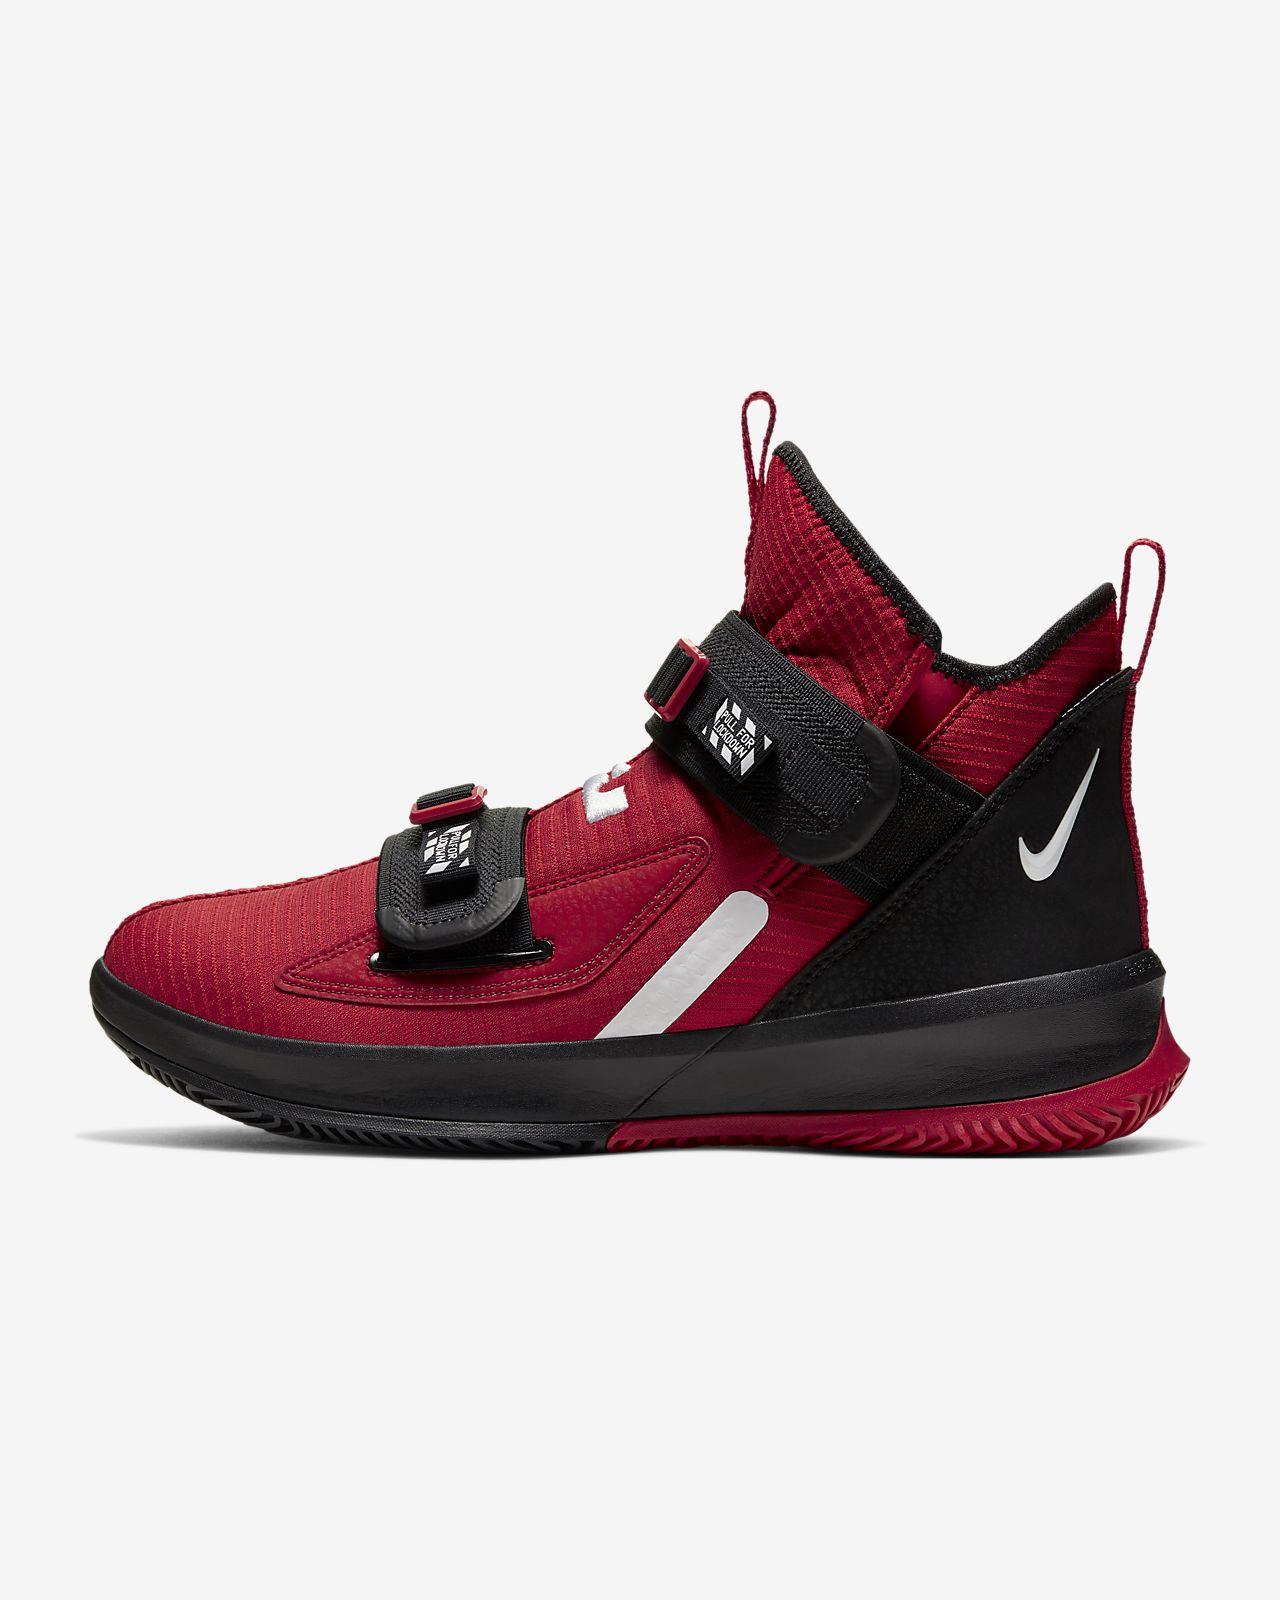 LeBron Soldier 13 SFG kosárlabdacipő